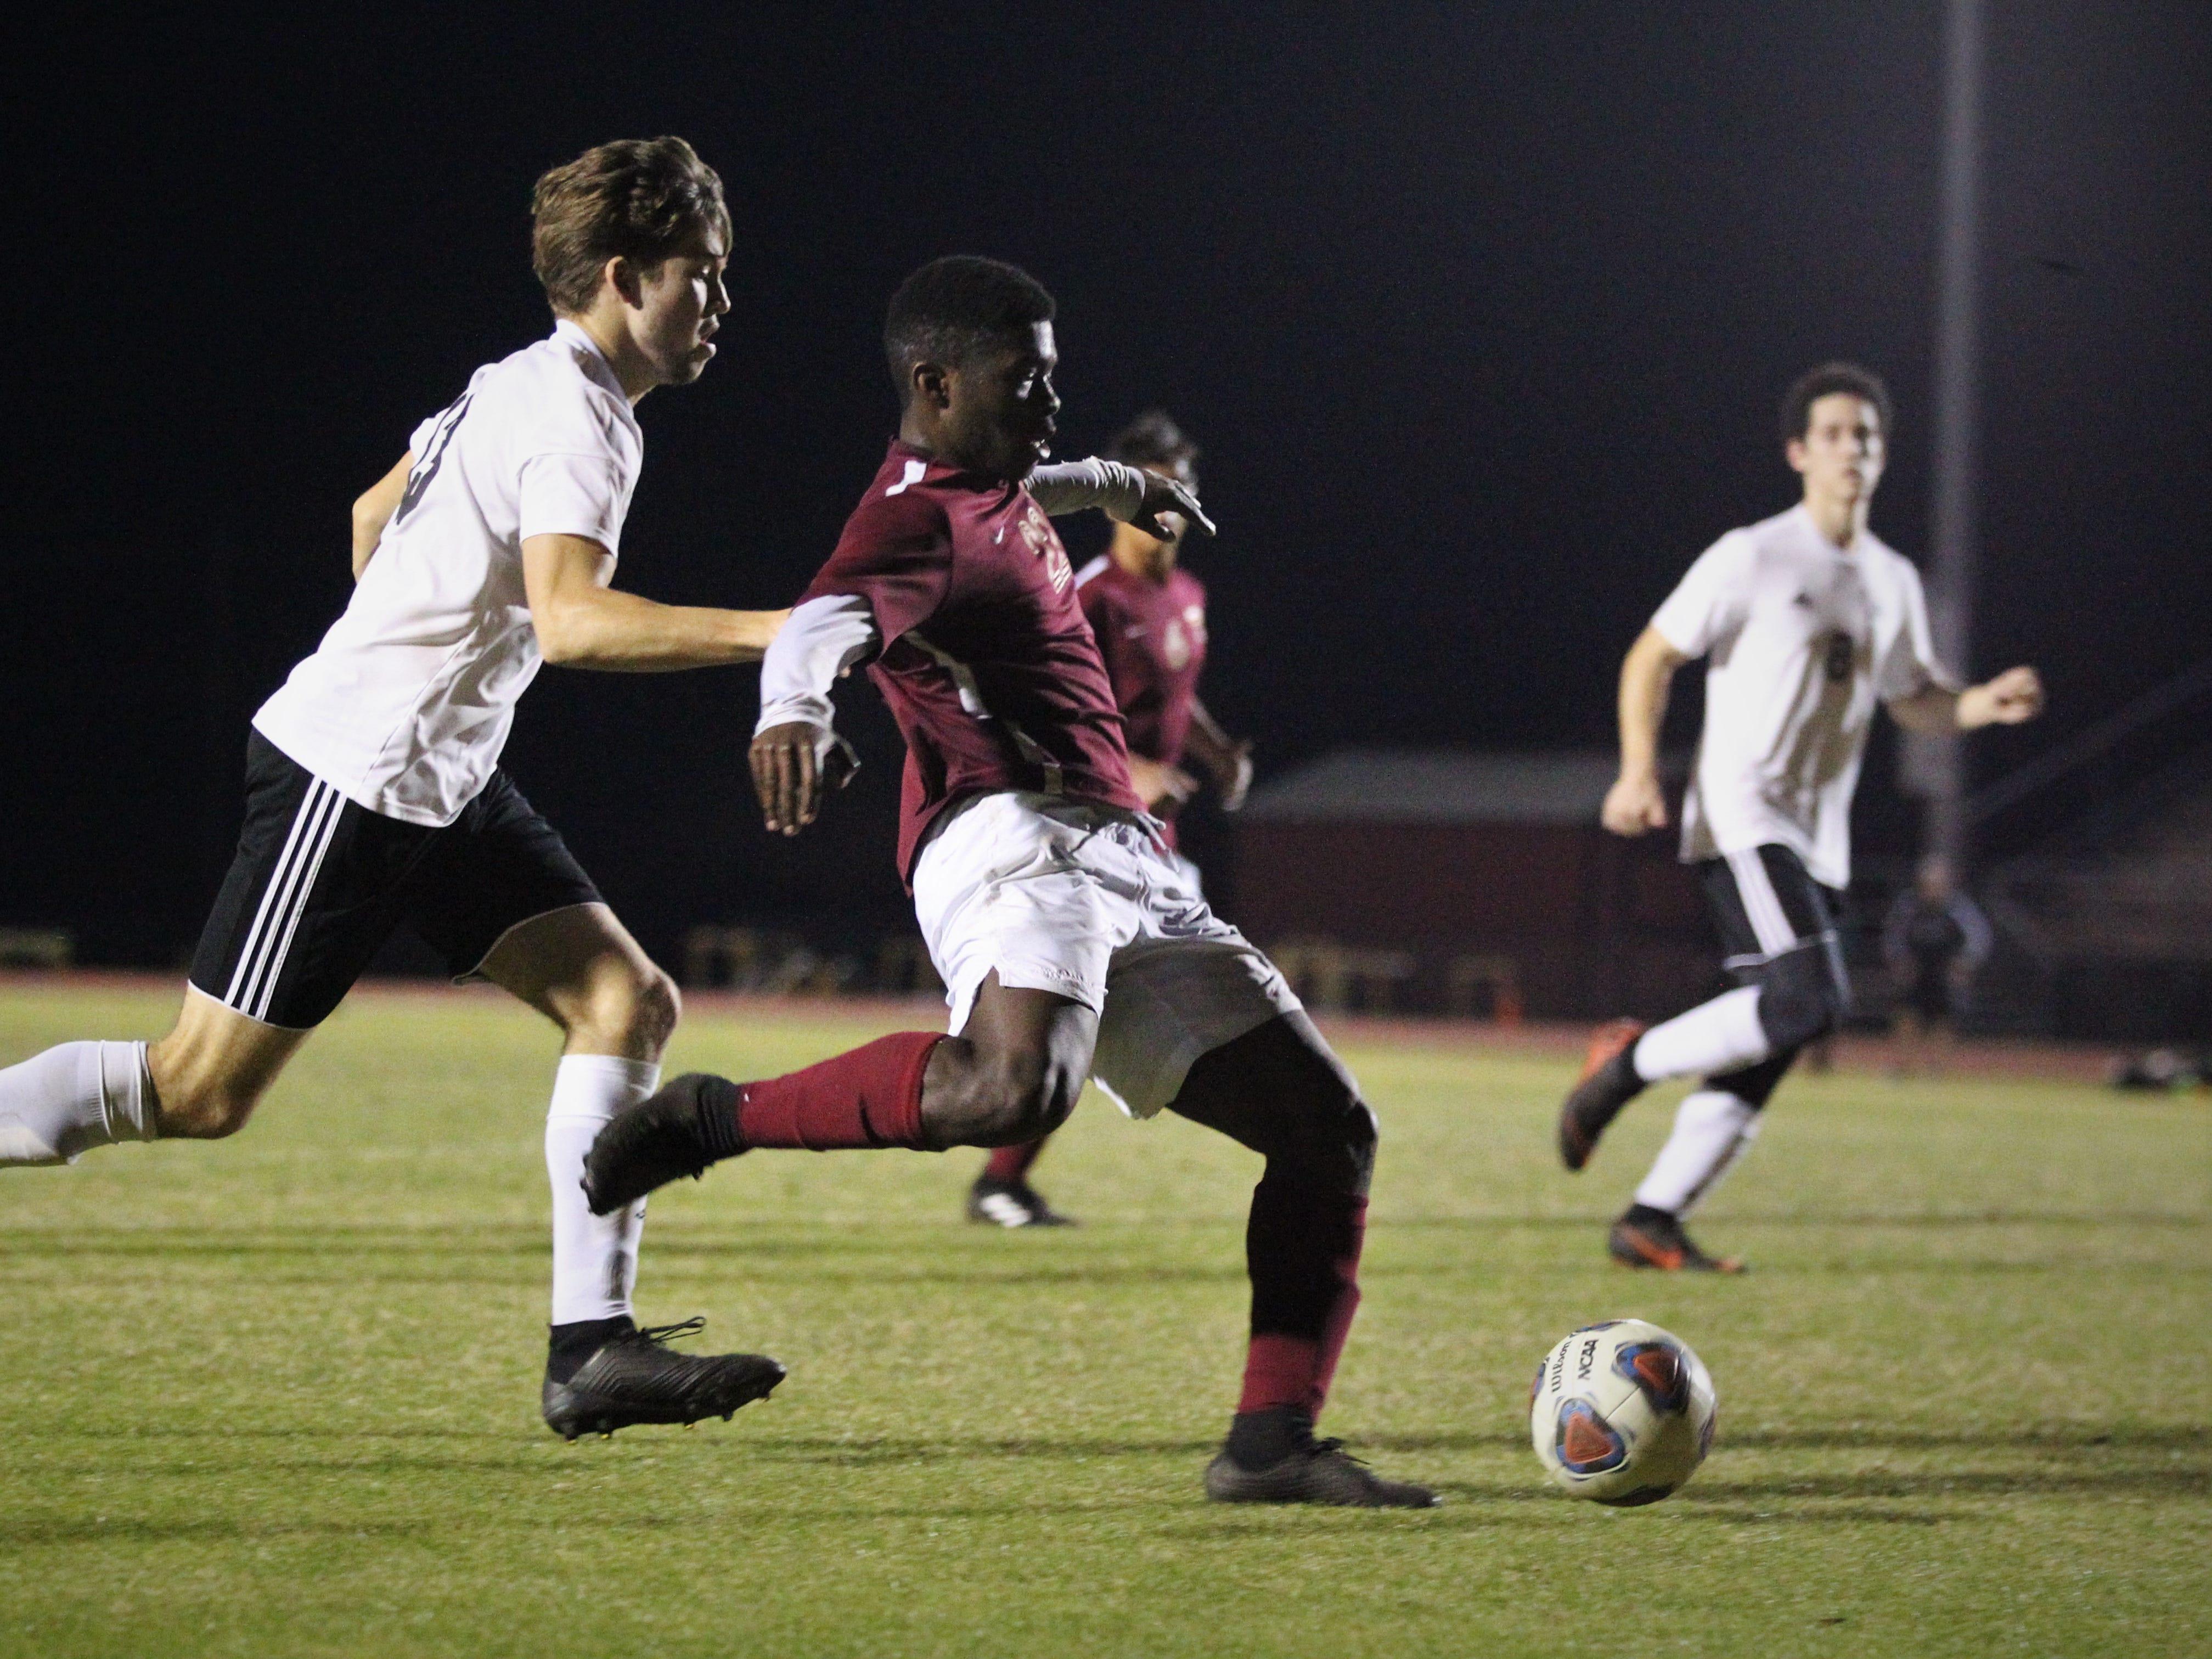 Florida High's Delali Simpson takes a shot on goal as Florida High's boys soccer team beat South Walton 2-0 during a Region 1-2A quarterfinal on Feb. 6, 2018.